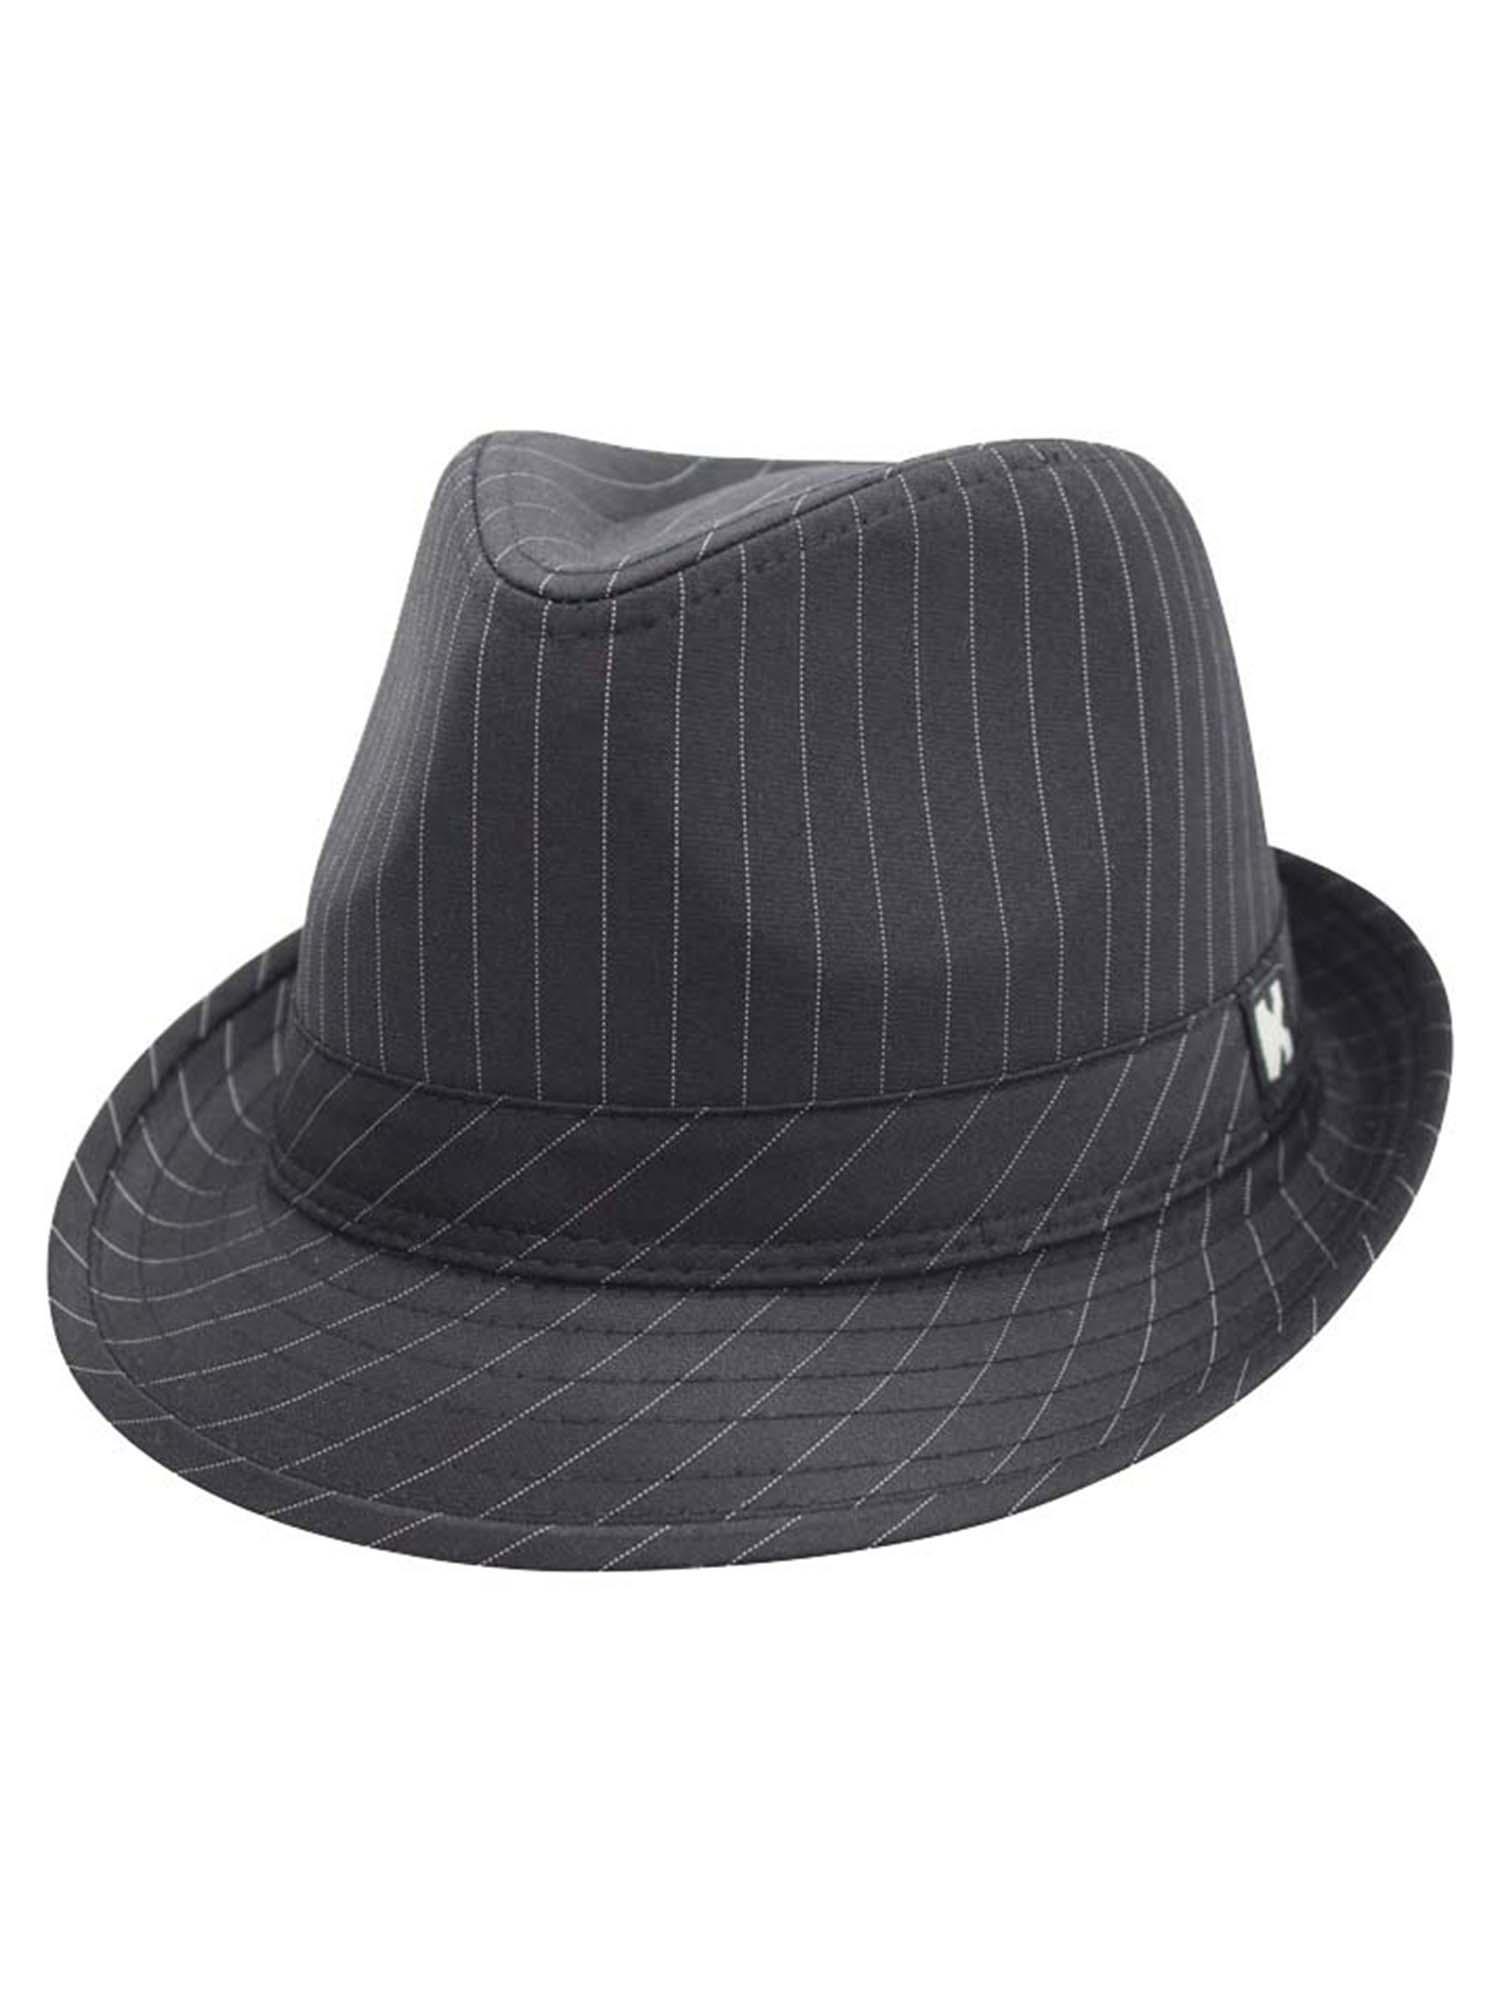 328452e035e4b BLACK CLASSIC PINSTRIPE TRILBY FEDORA HAT SIZE LARGE